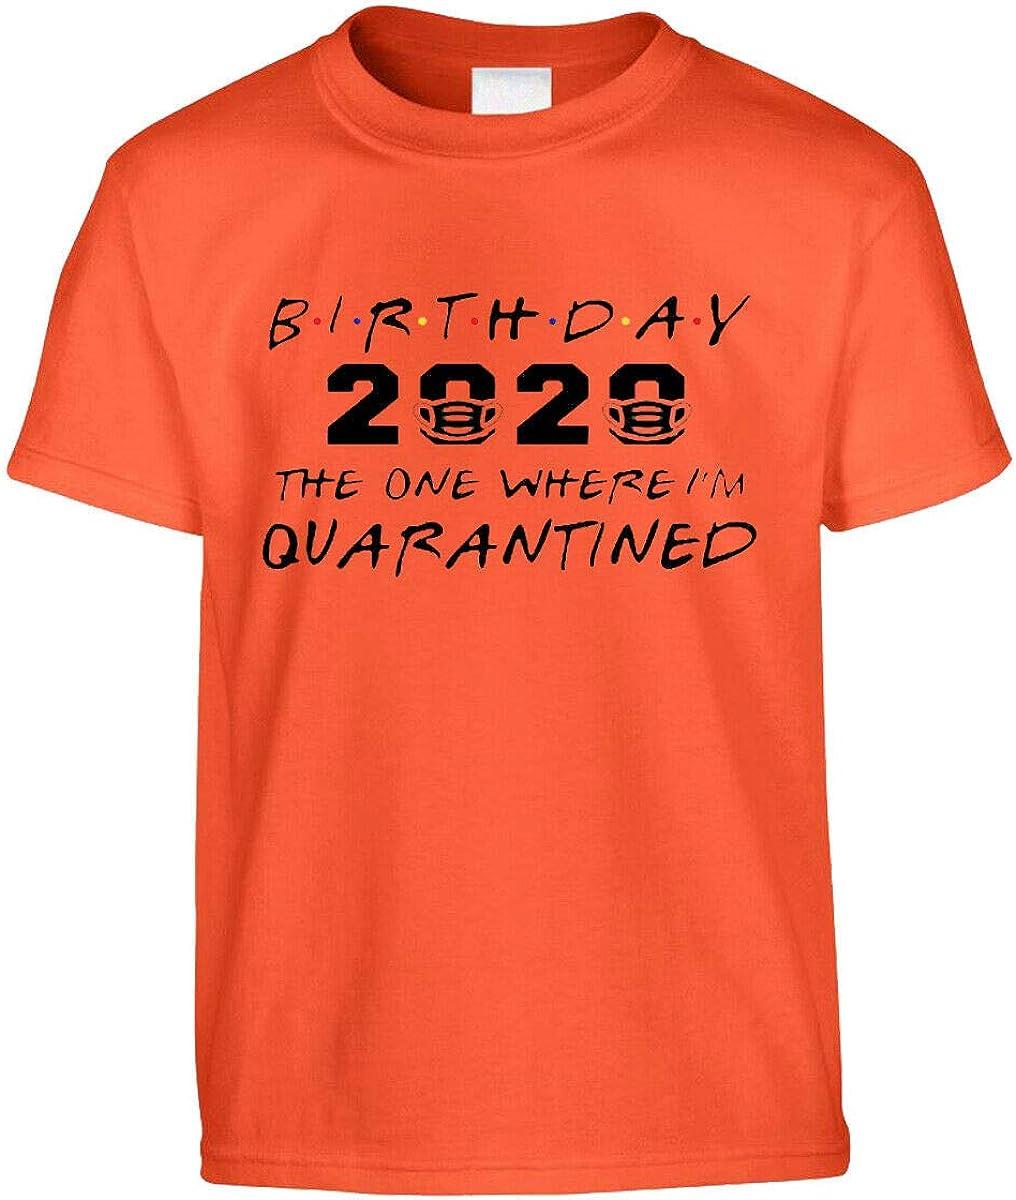 Unisex Kids T Shirt Amo Distro Virus Top Kids T Shirt Birthday 2020 Social Distancing Quarantine Self Isolation